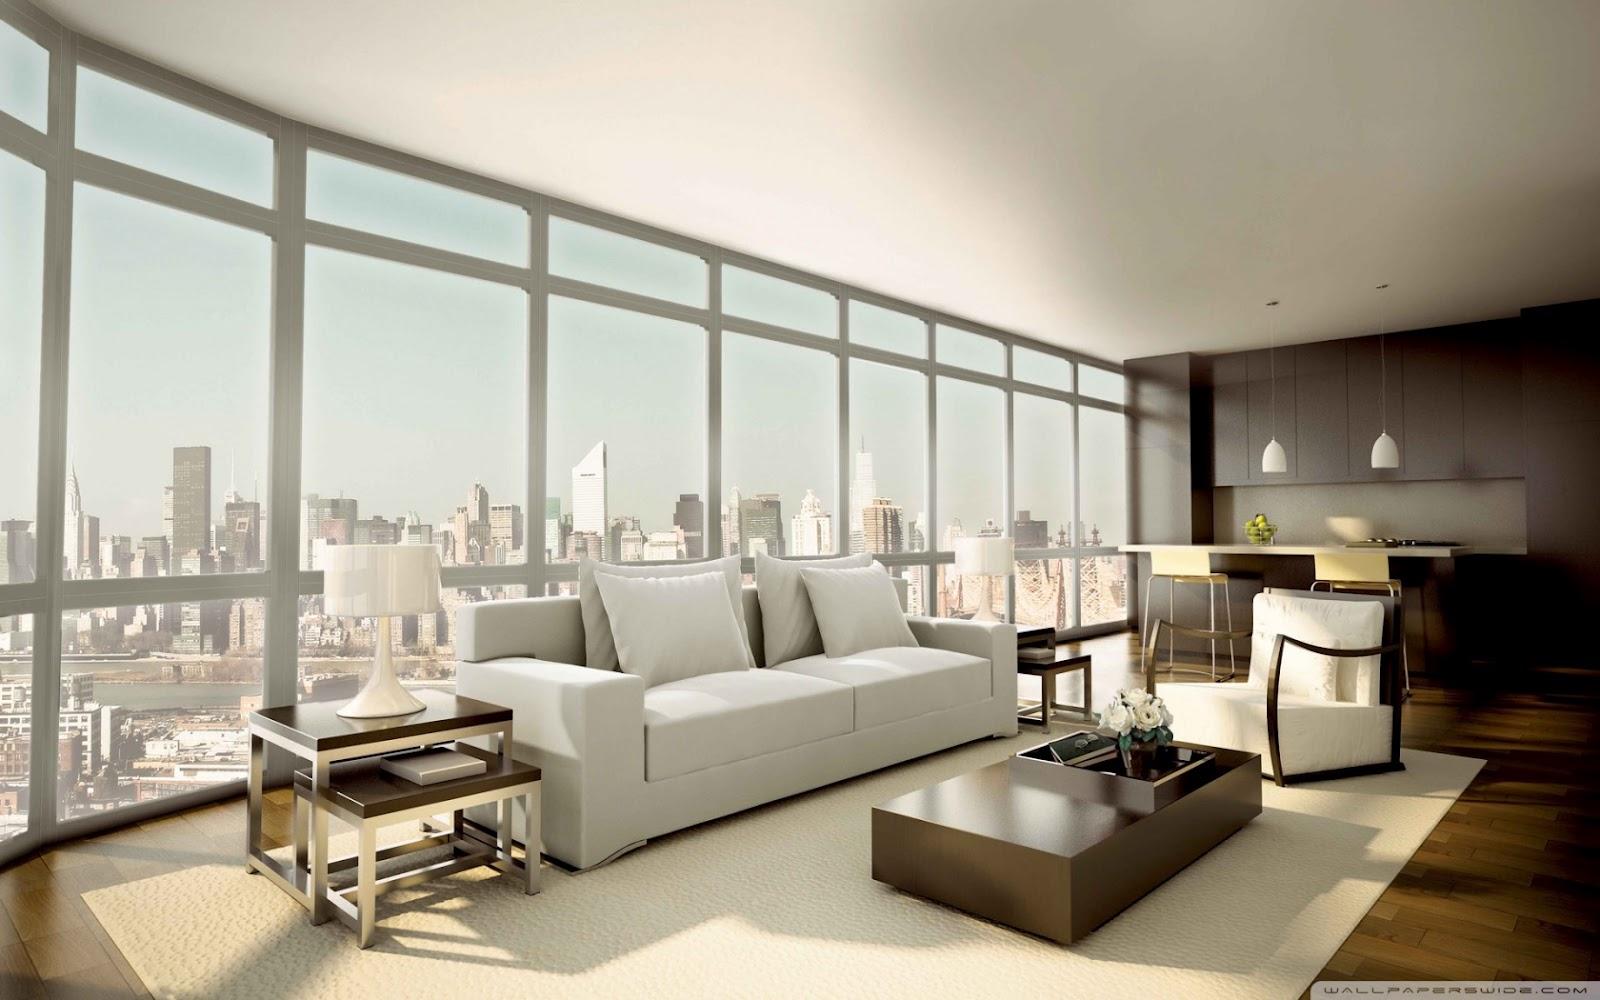 Living room furniture names - Living Room Furniture Names Heywood Wakefield Furniture Names